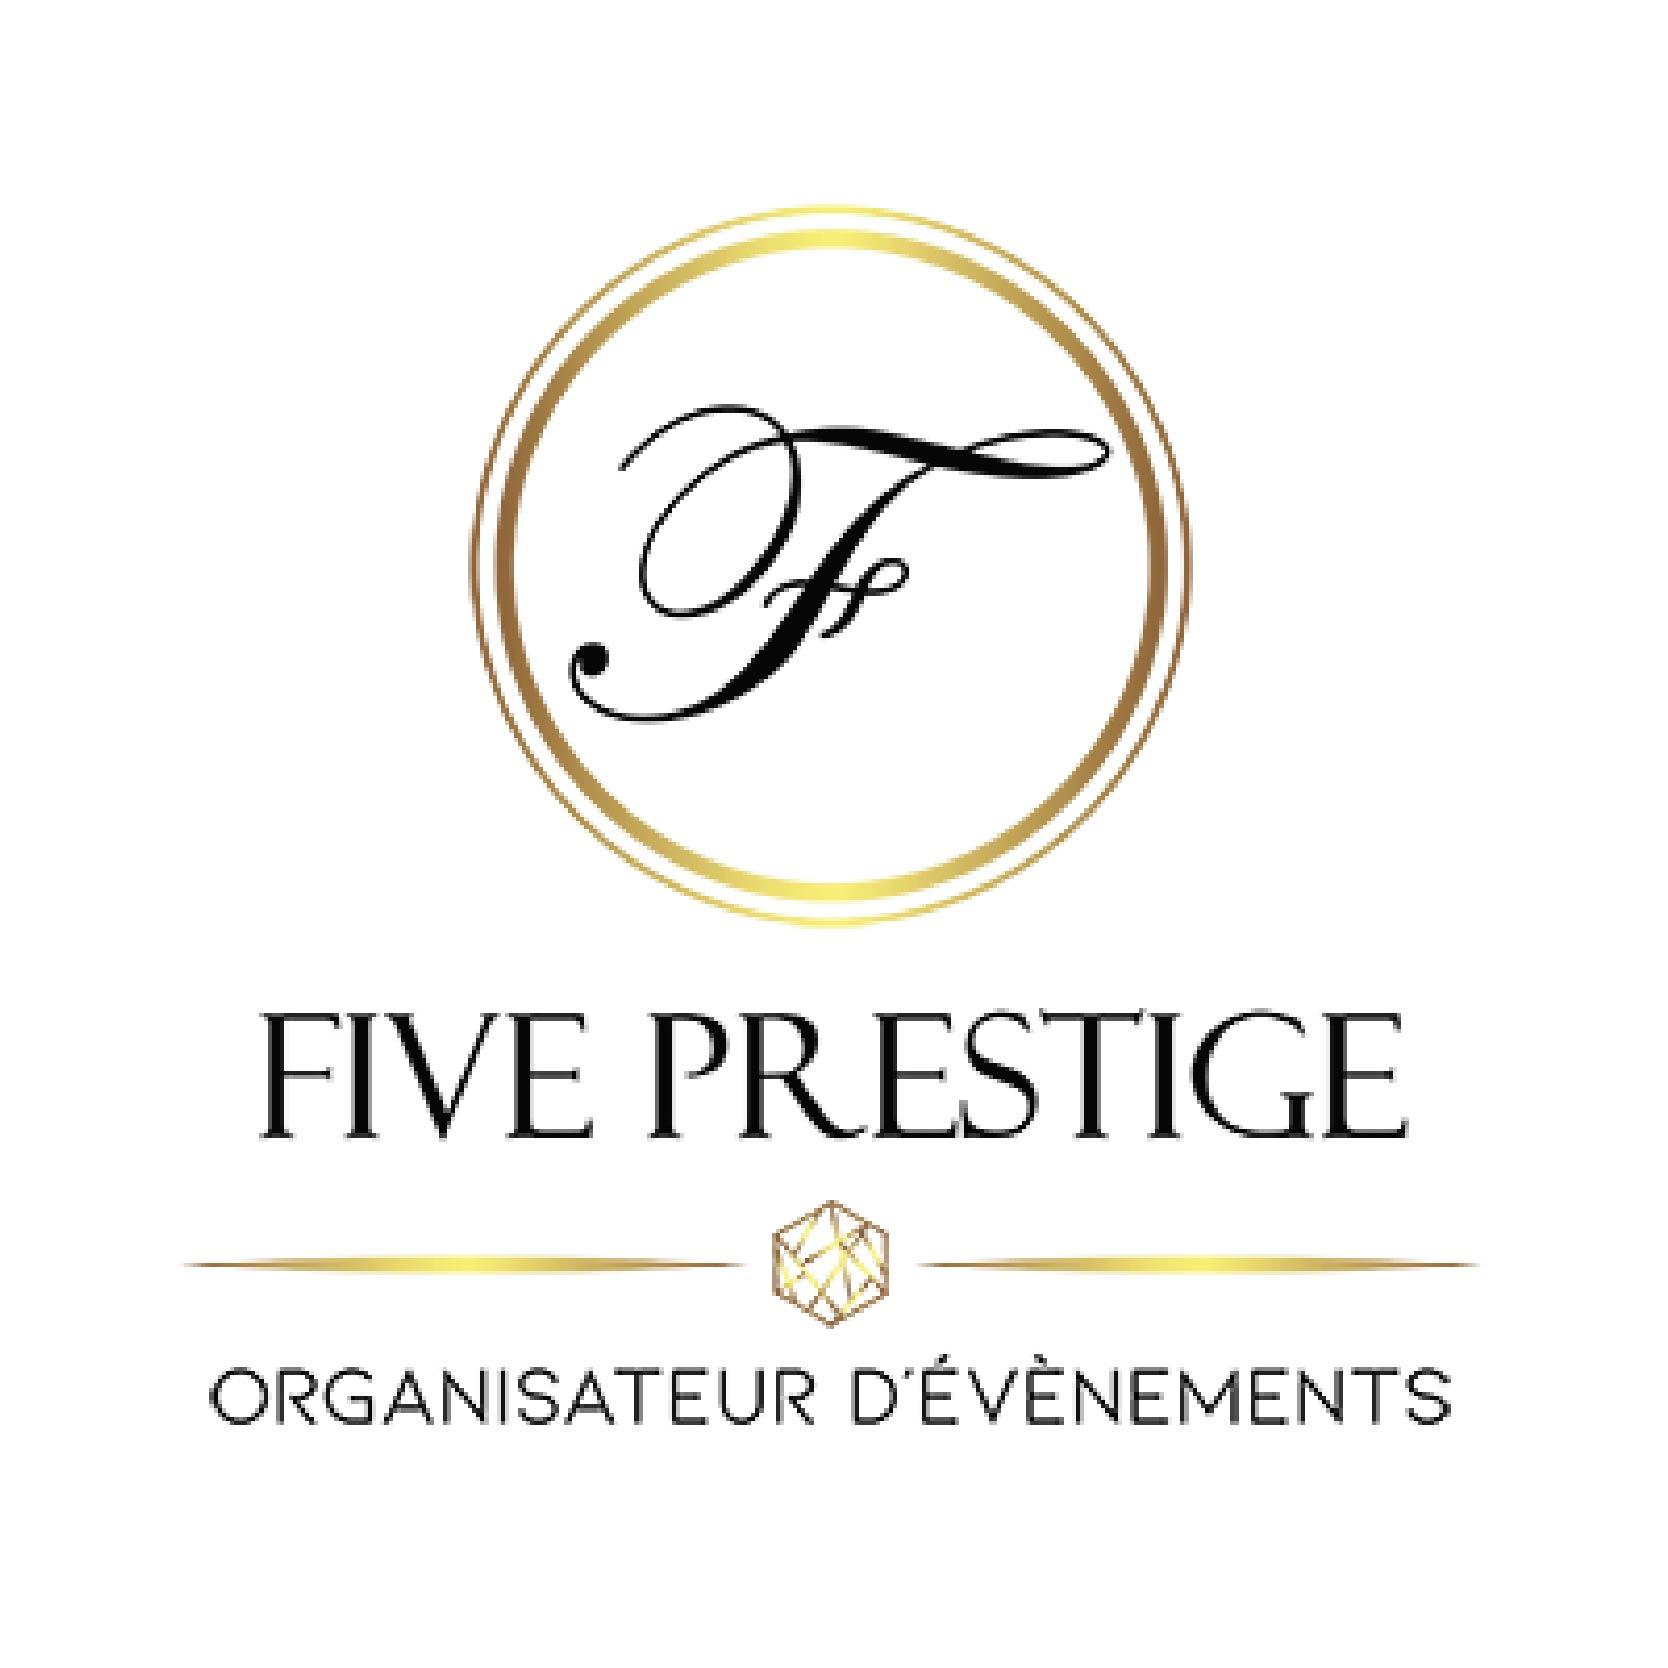 Five Prestige